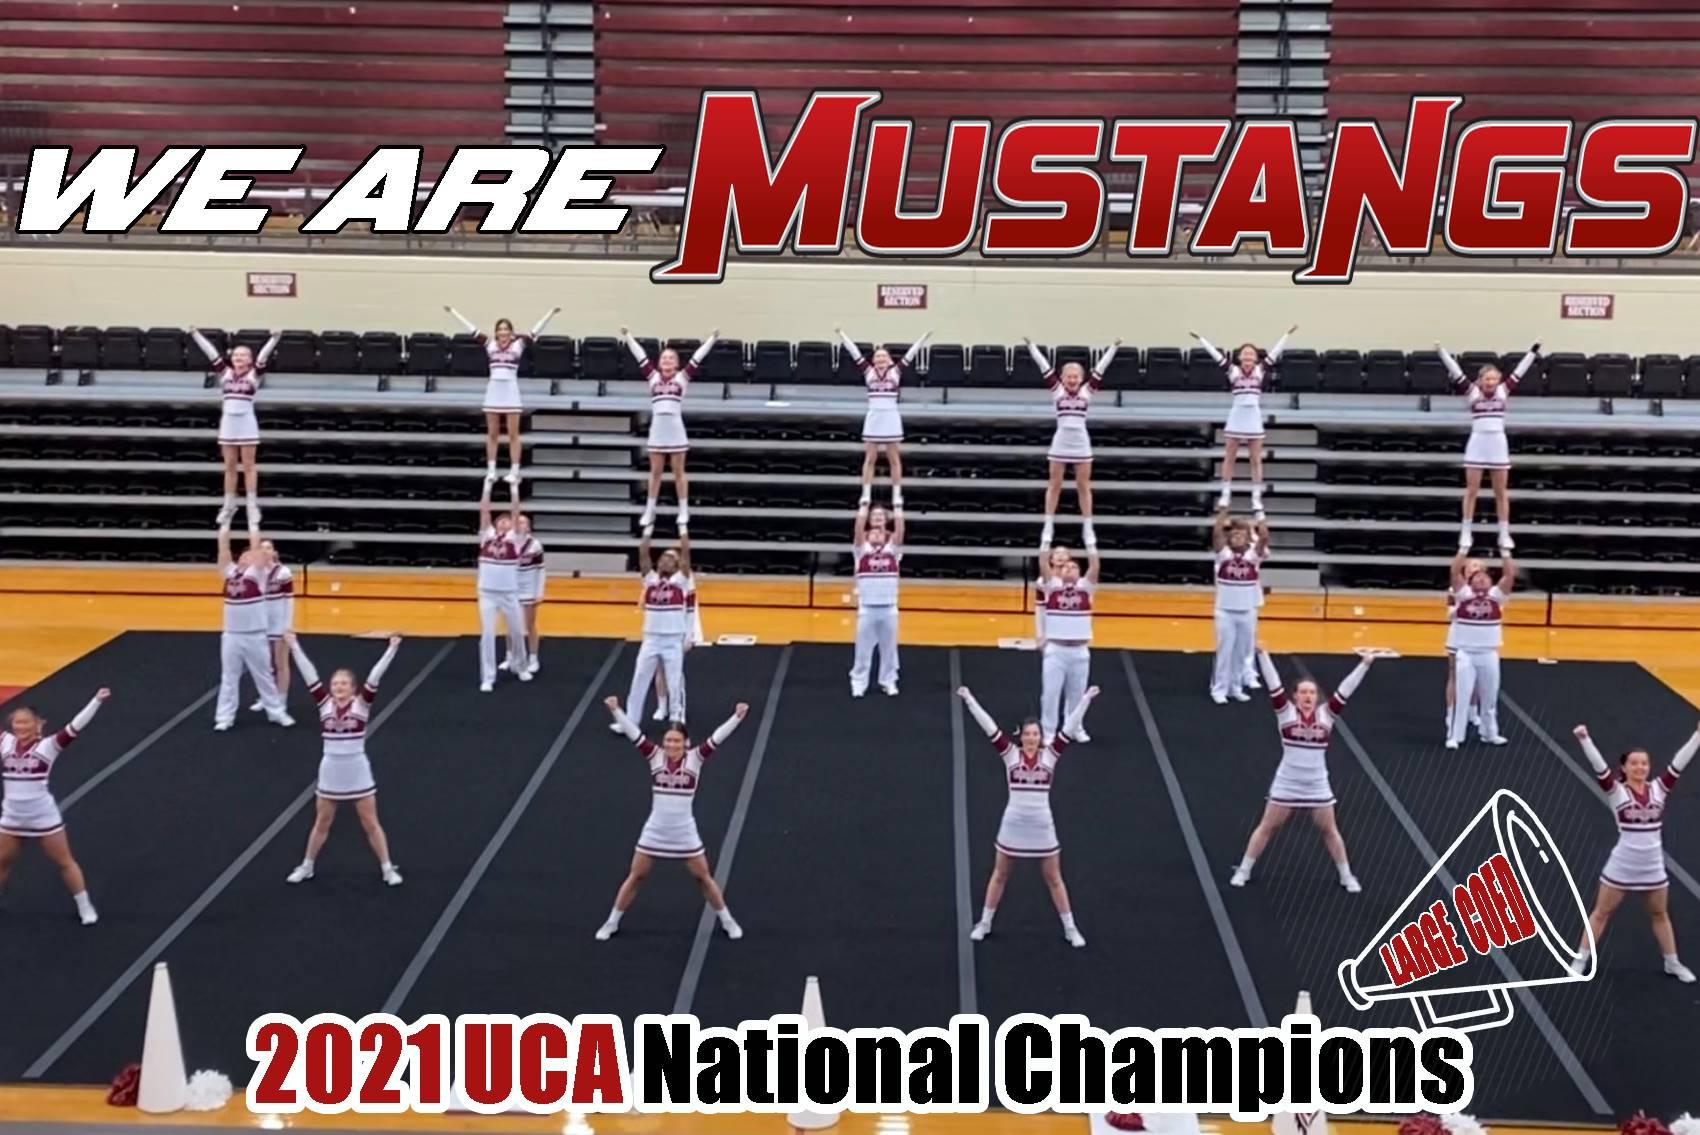 Mustangs Coed Cheer - 2021 UCA National Champions!!